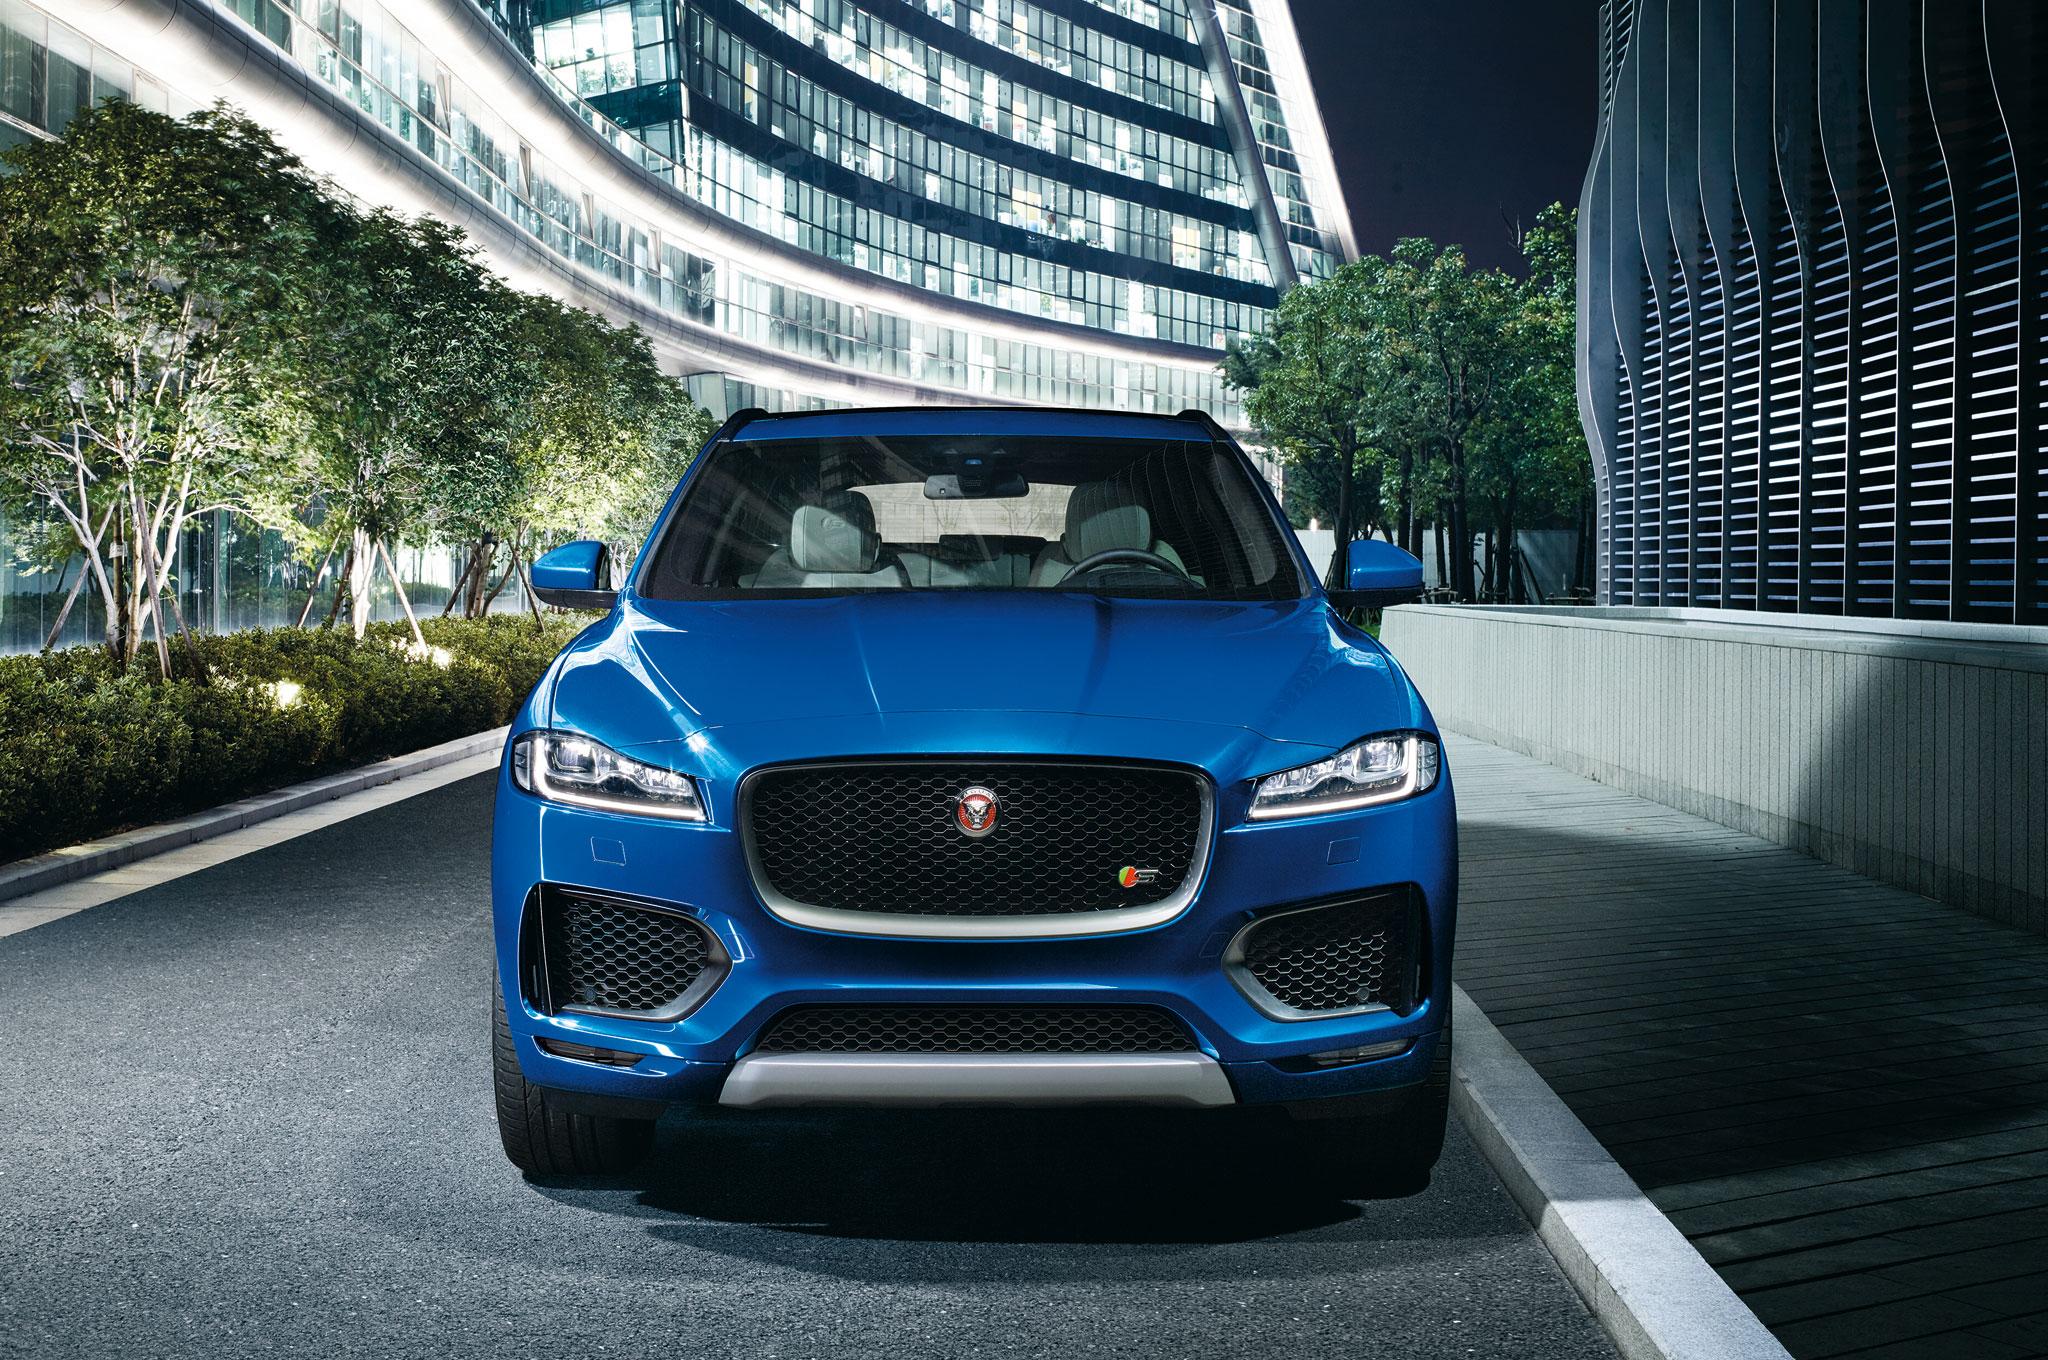 cx suv autocar exterior and redesign review jaguar price interior